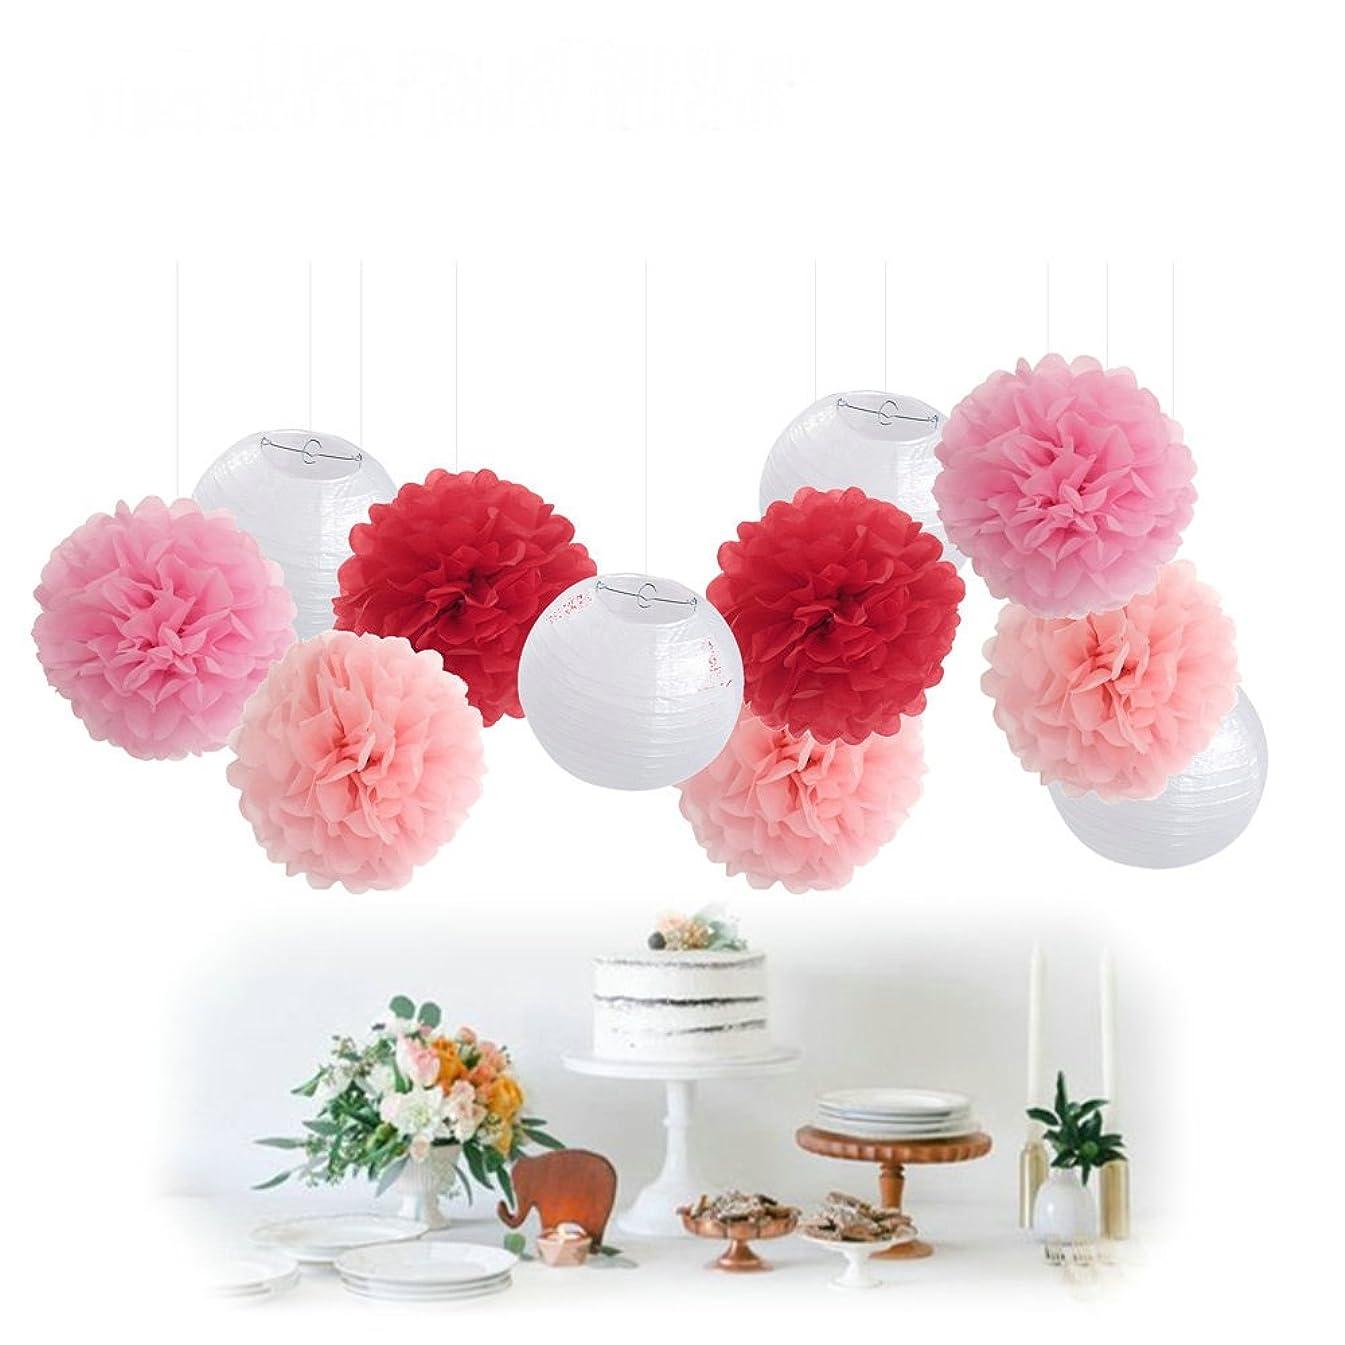 11pcs Mixed Pink White Decorative Paper Pompoms Flower Hanging Paper Lantern Honeycomb Balls Wedding Birthday Christening Girl Baby Shower Nursery Mobiles